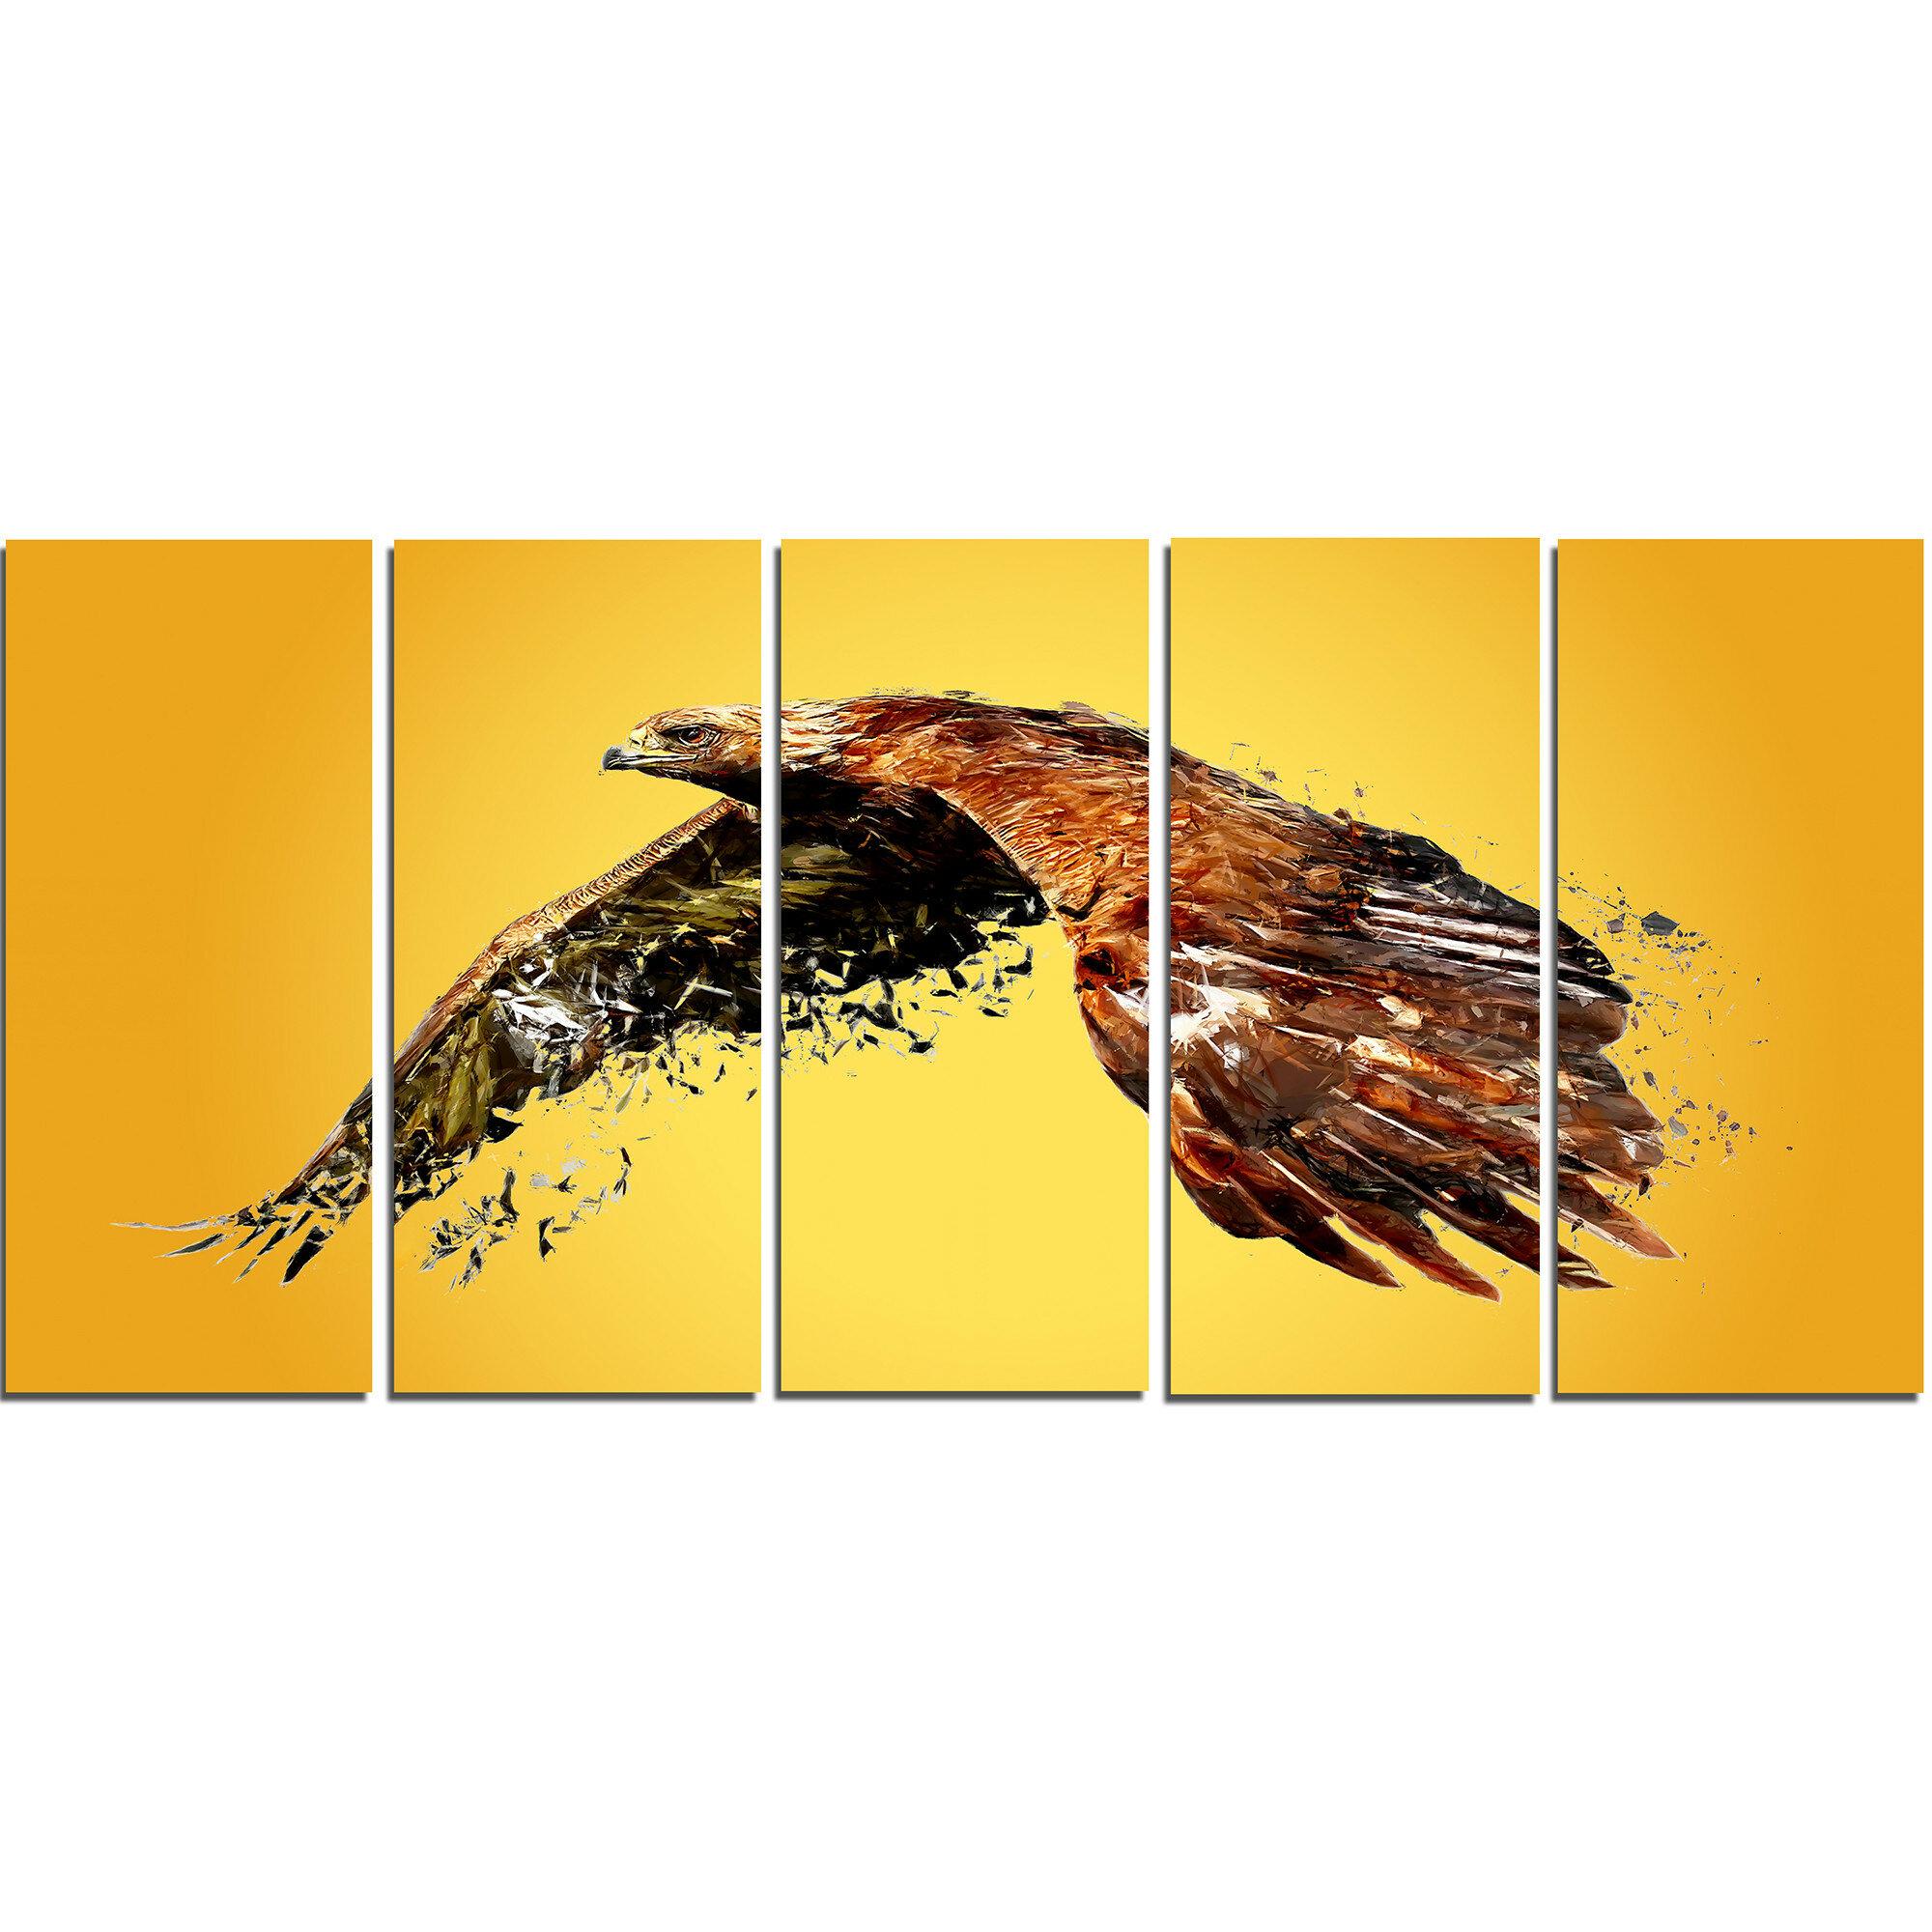 DesignArt Metal \'Soaring Eagle\' 5 Piece Graphic Art Set | Wayfair